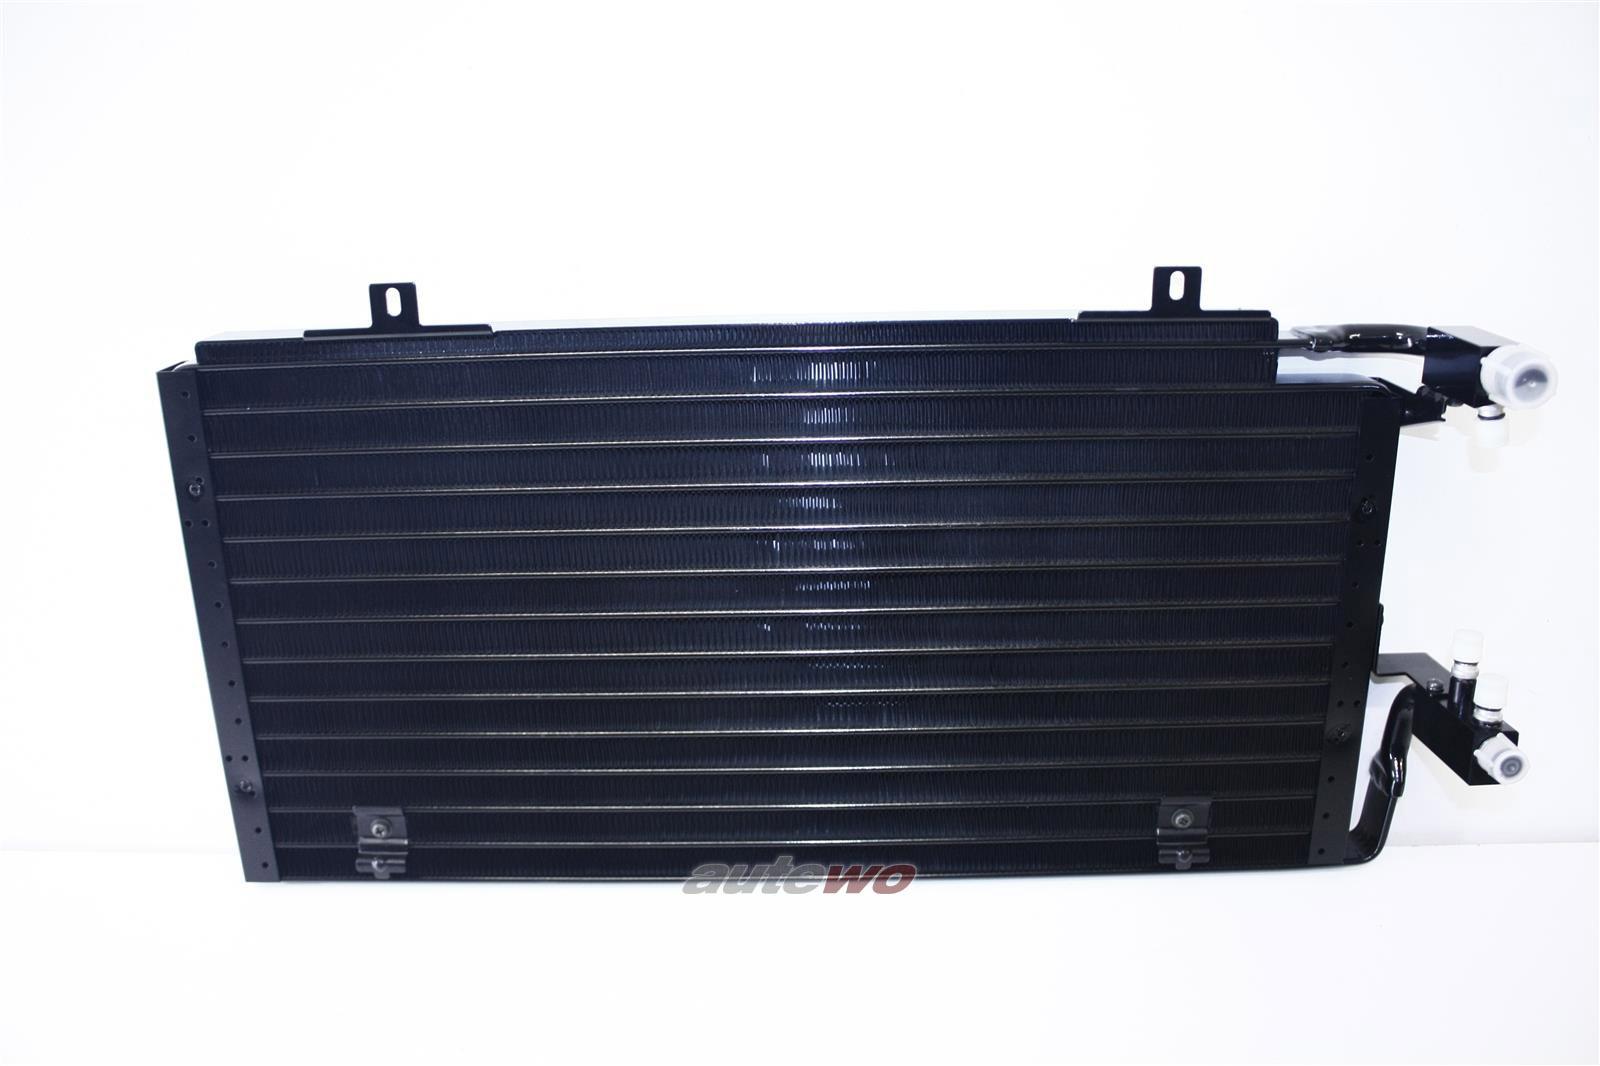 893260403F NEU Audi 80 Typ 89 4 Zyl. Klimakondensator Kältemittel R12